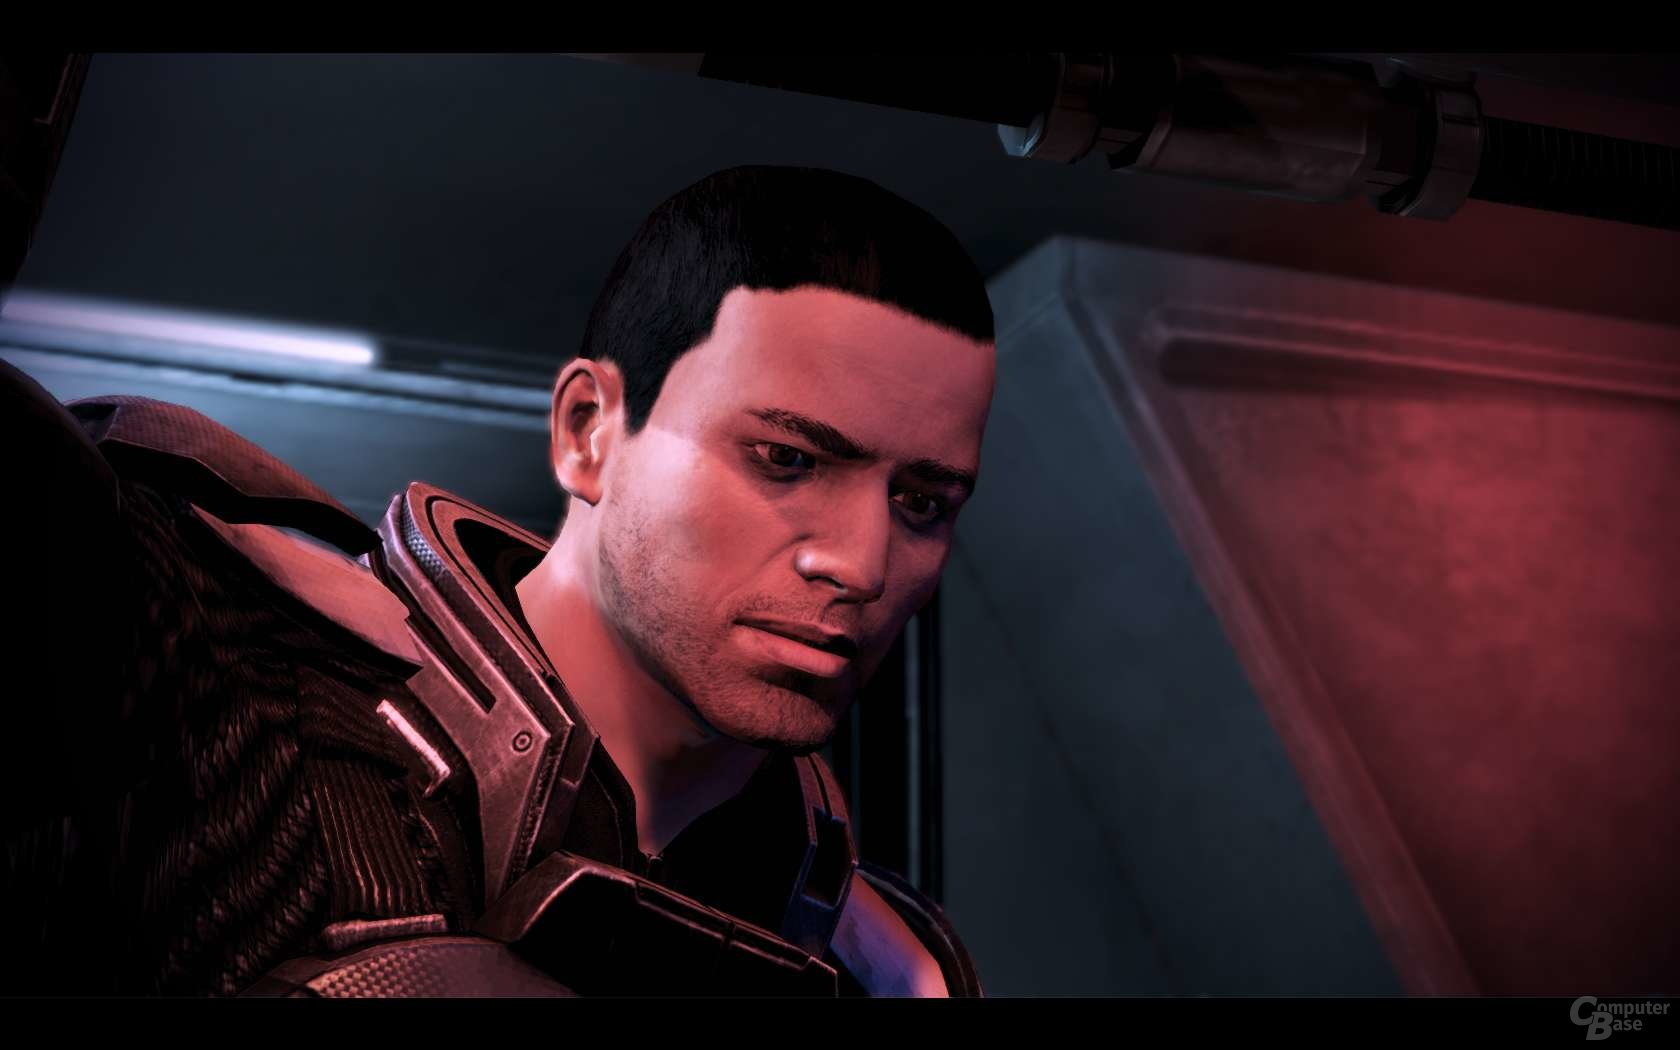 Commander Shephard - Zurück in Aktion